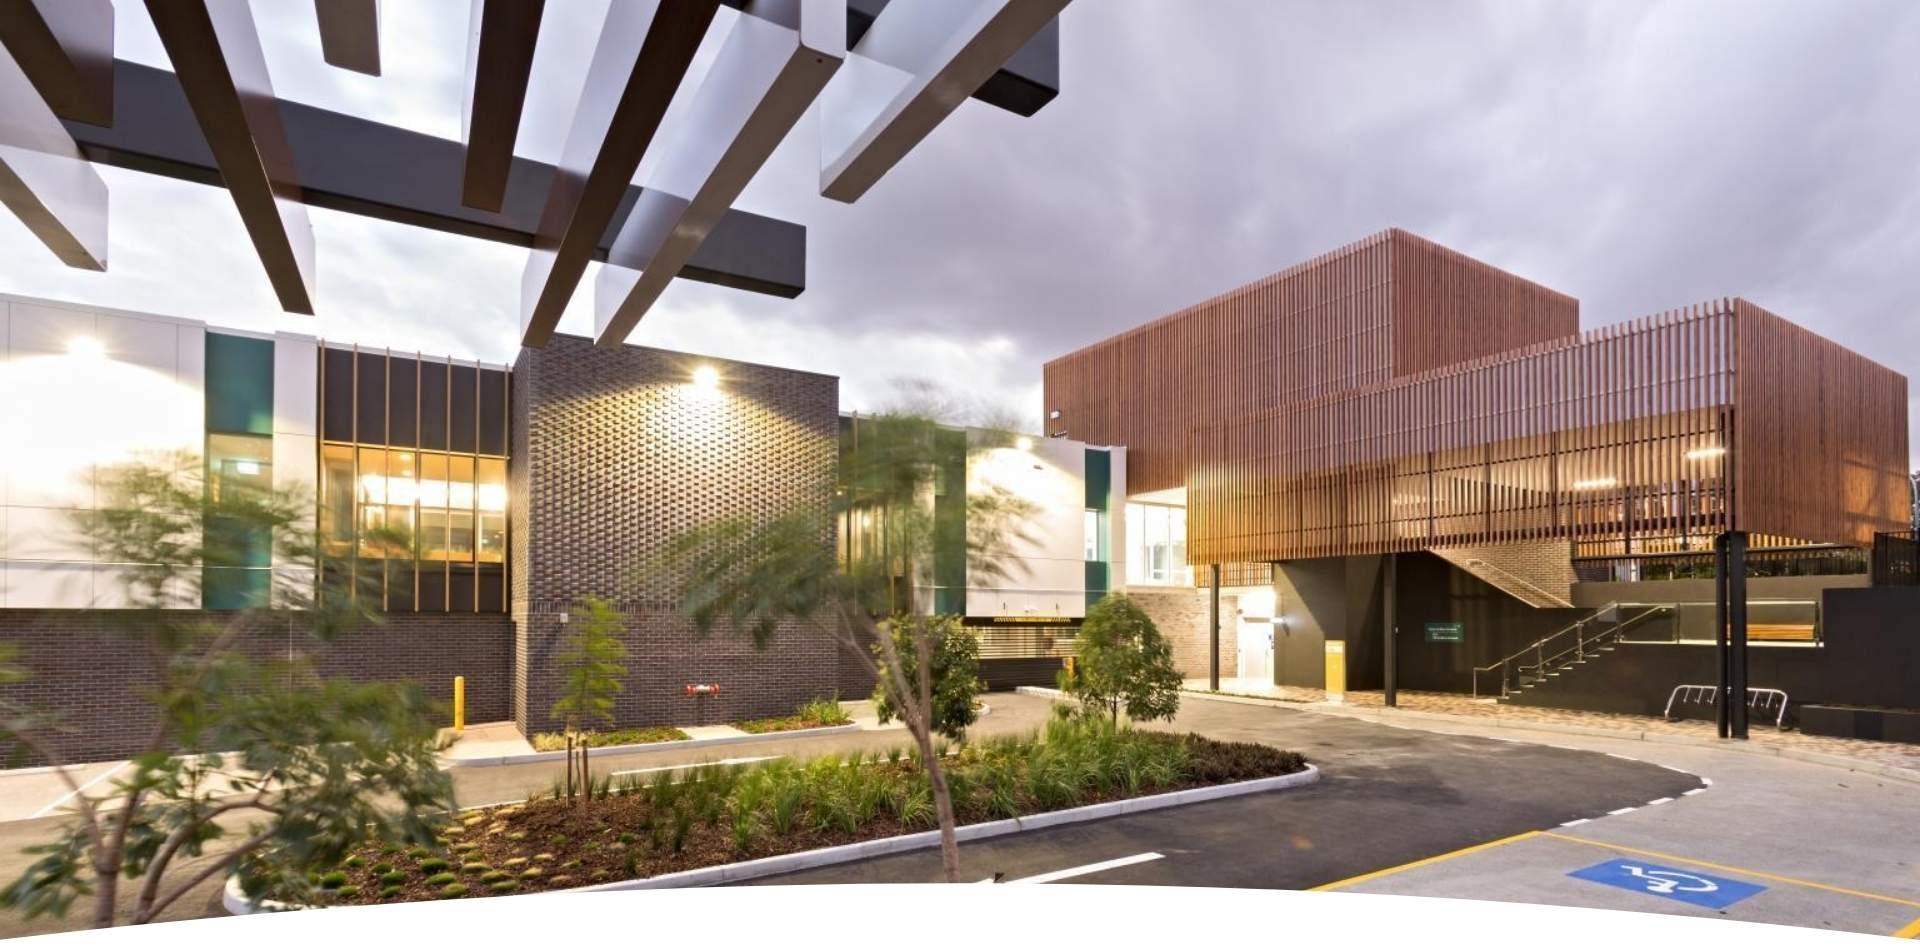 Aluminium Balustrades - Timber-look Façade adds therapeutic touch in Jacaranda Place